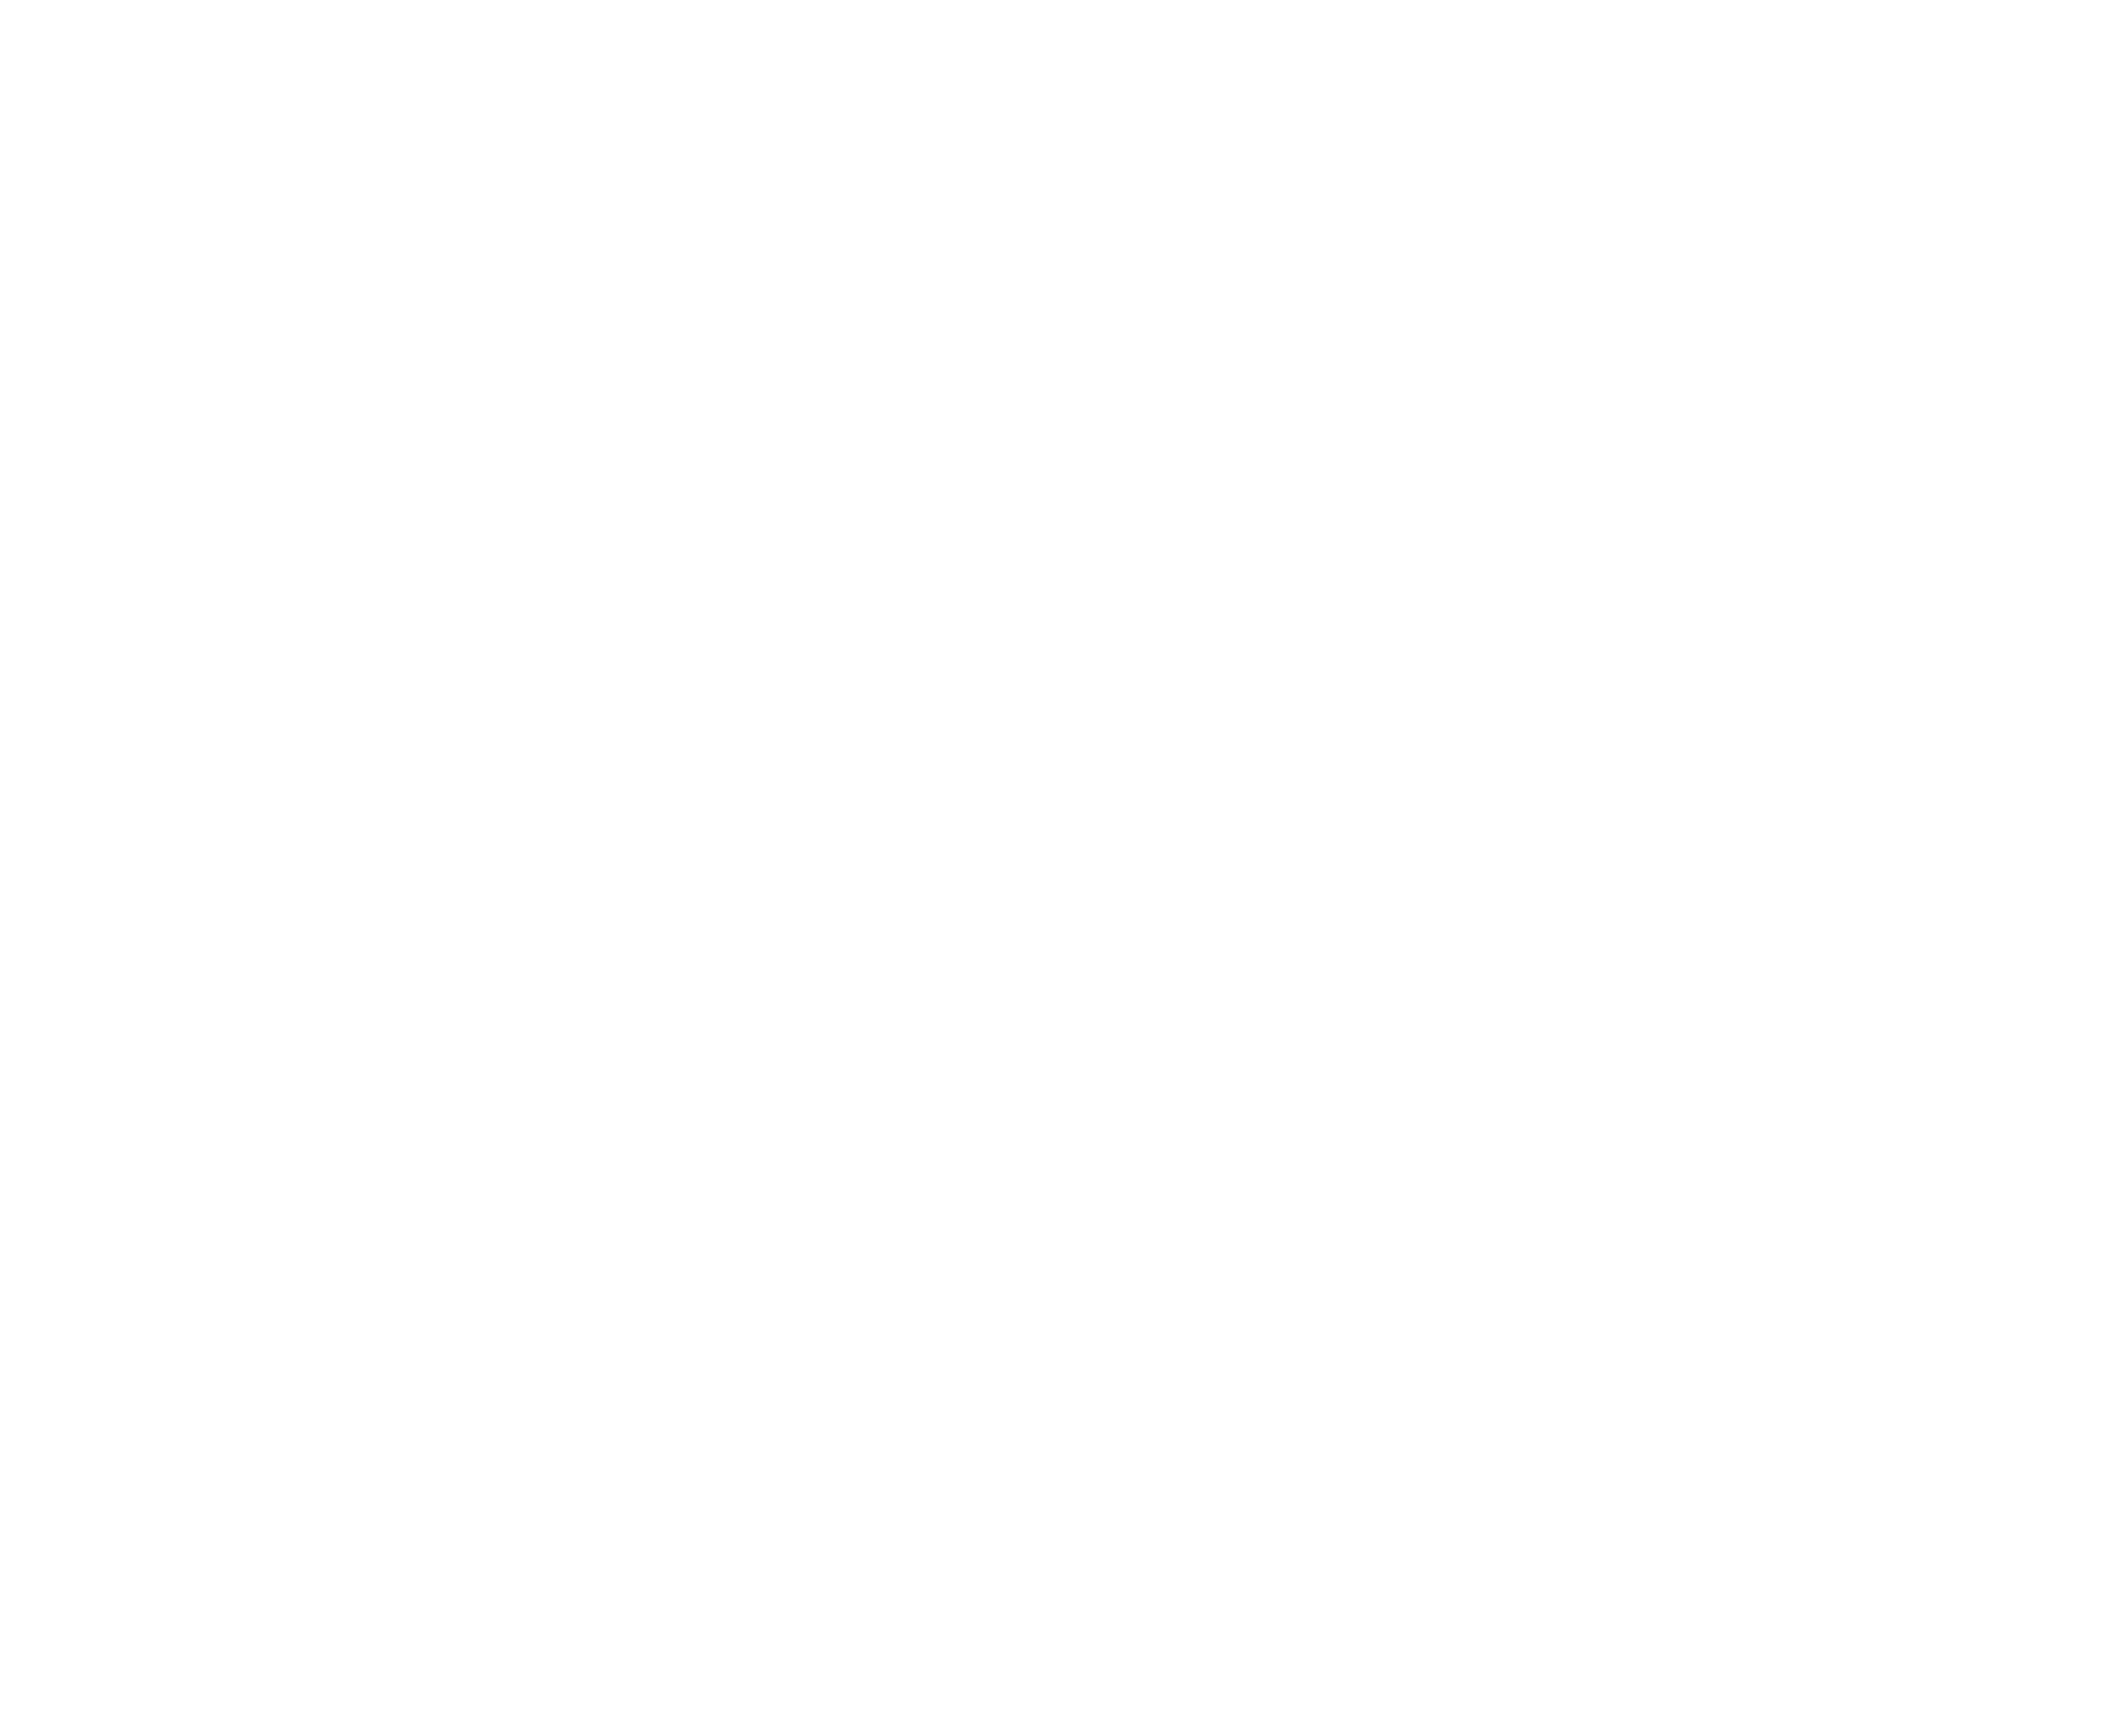 Bruntwood-04